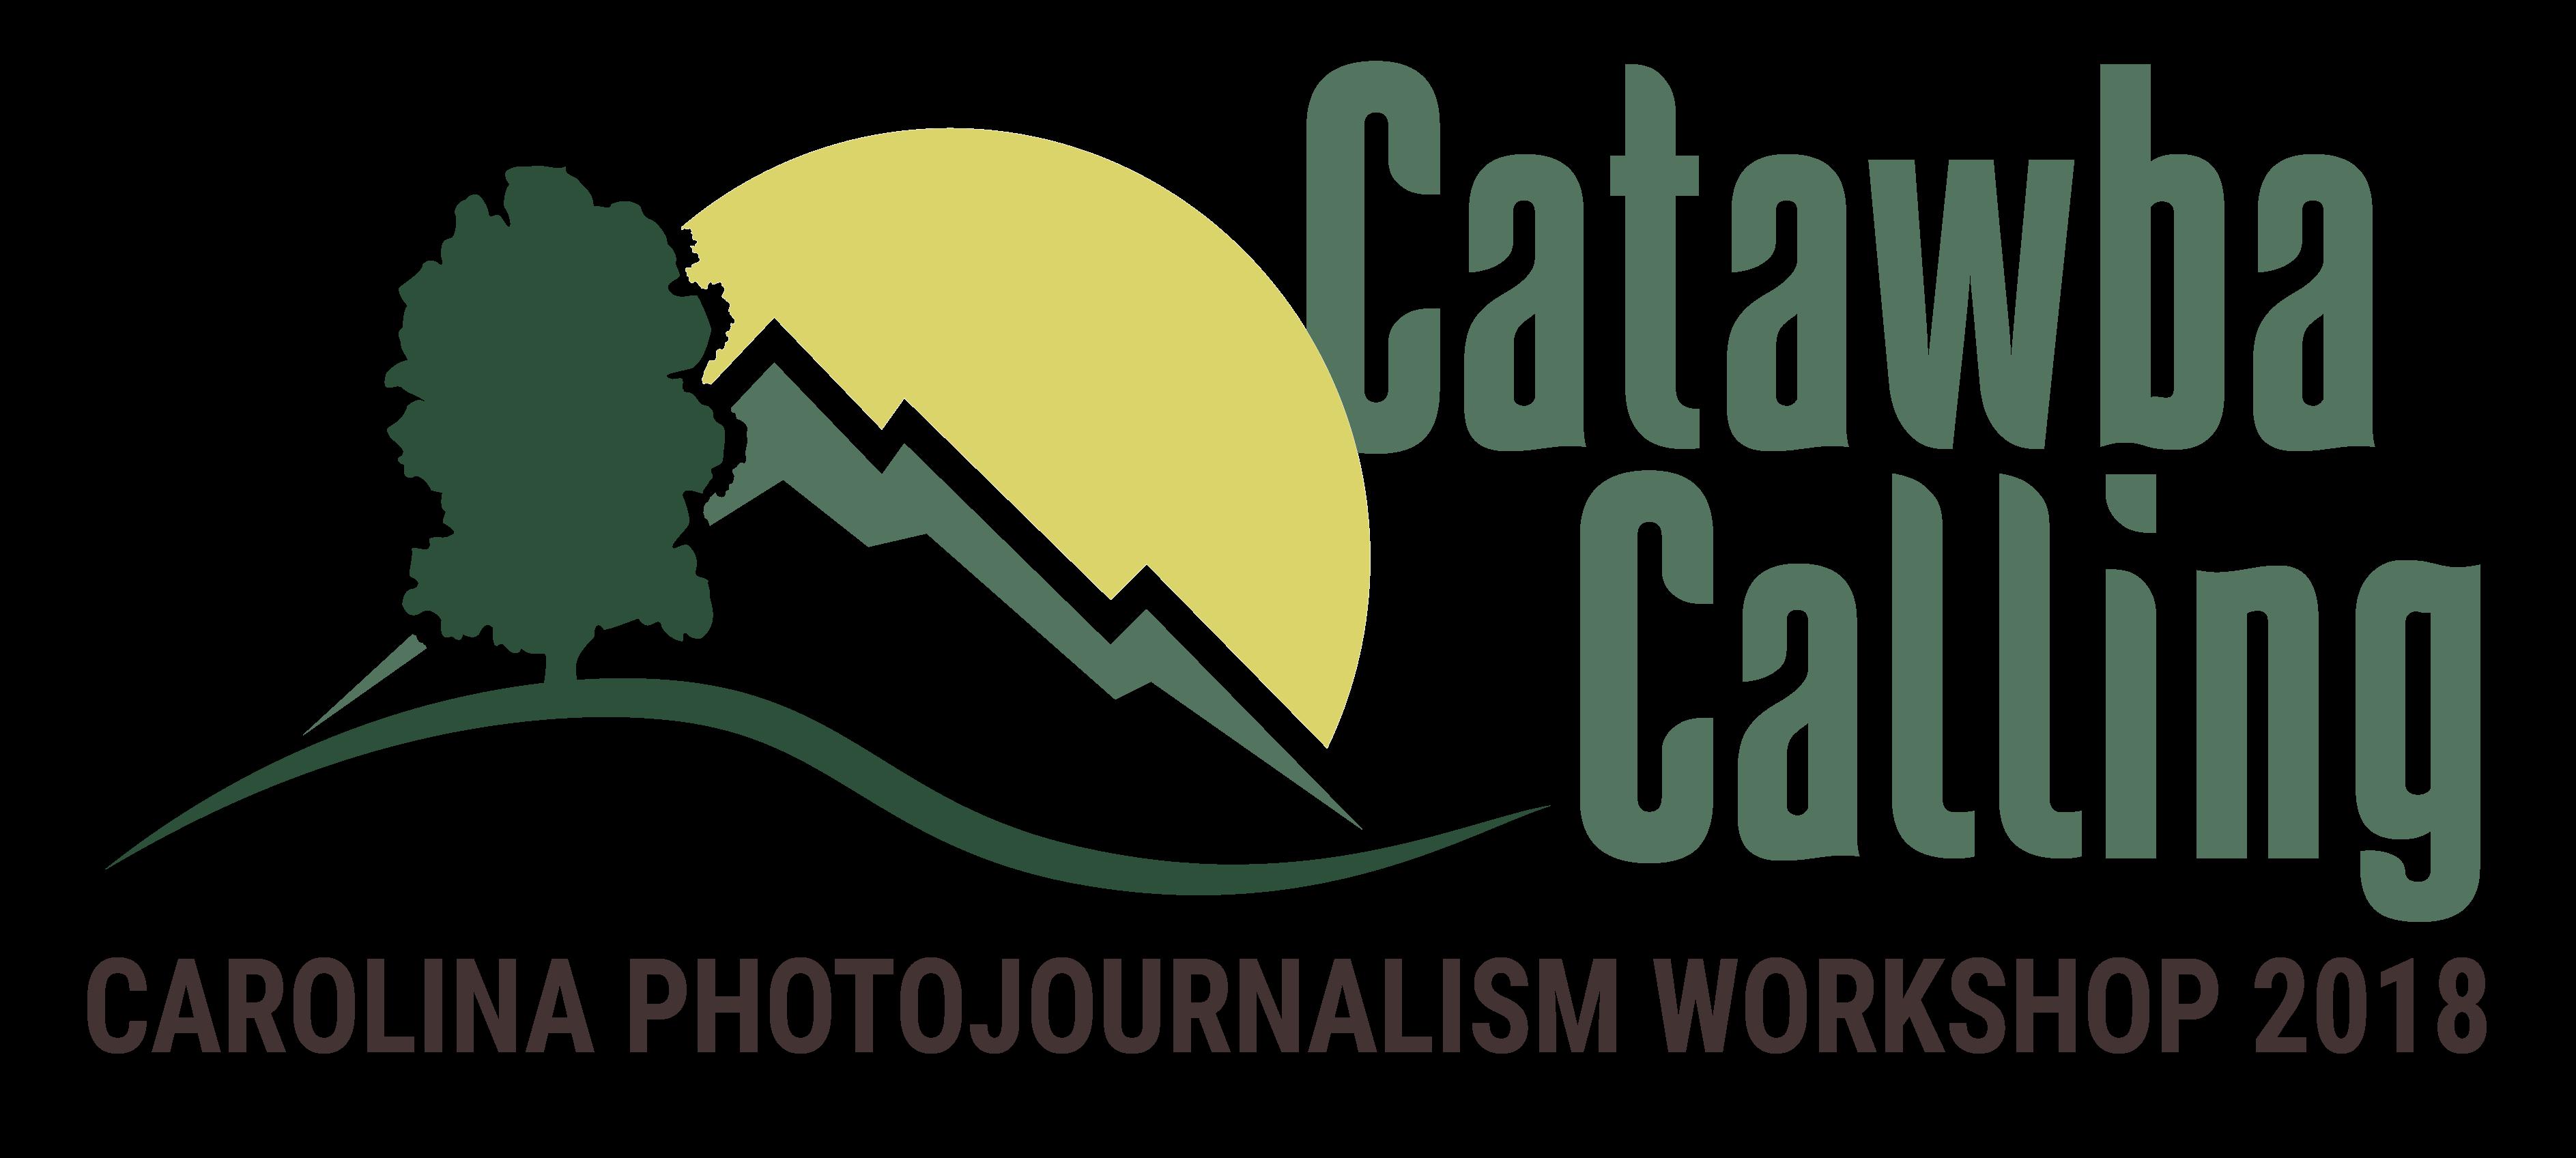 2018 Catawba Calling